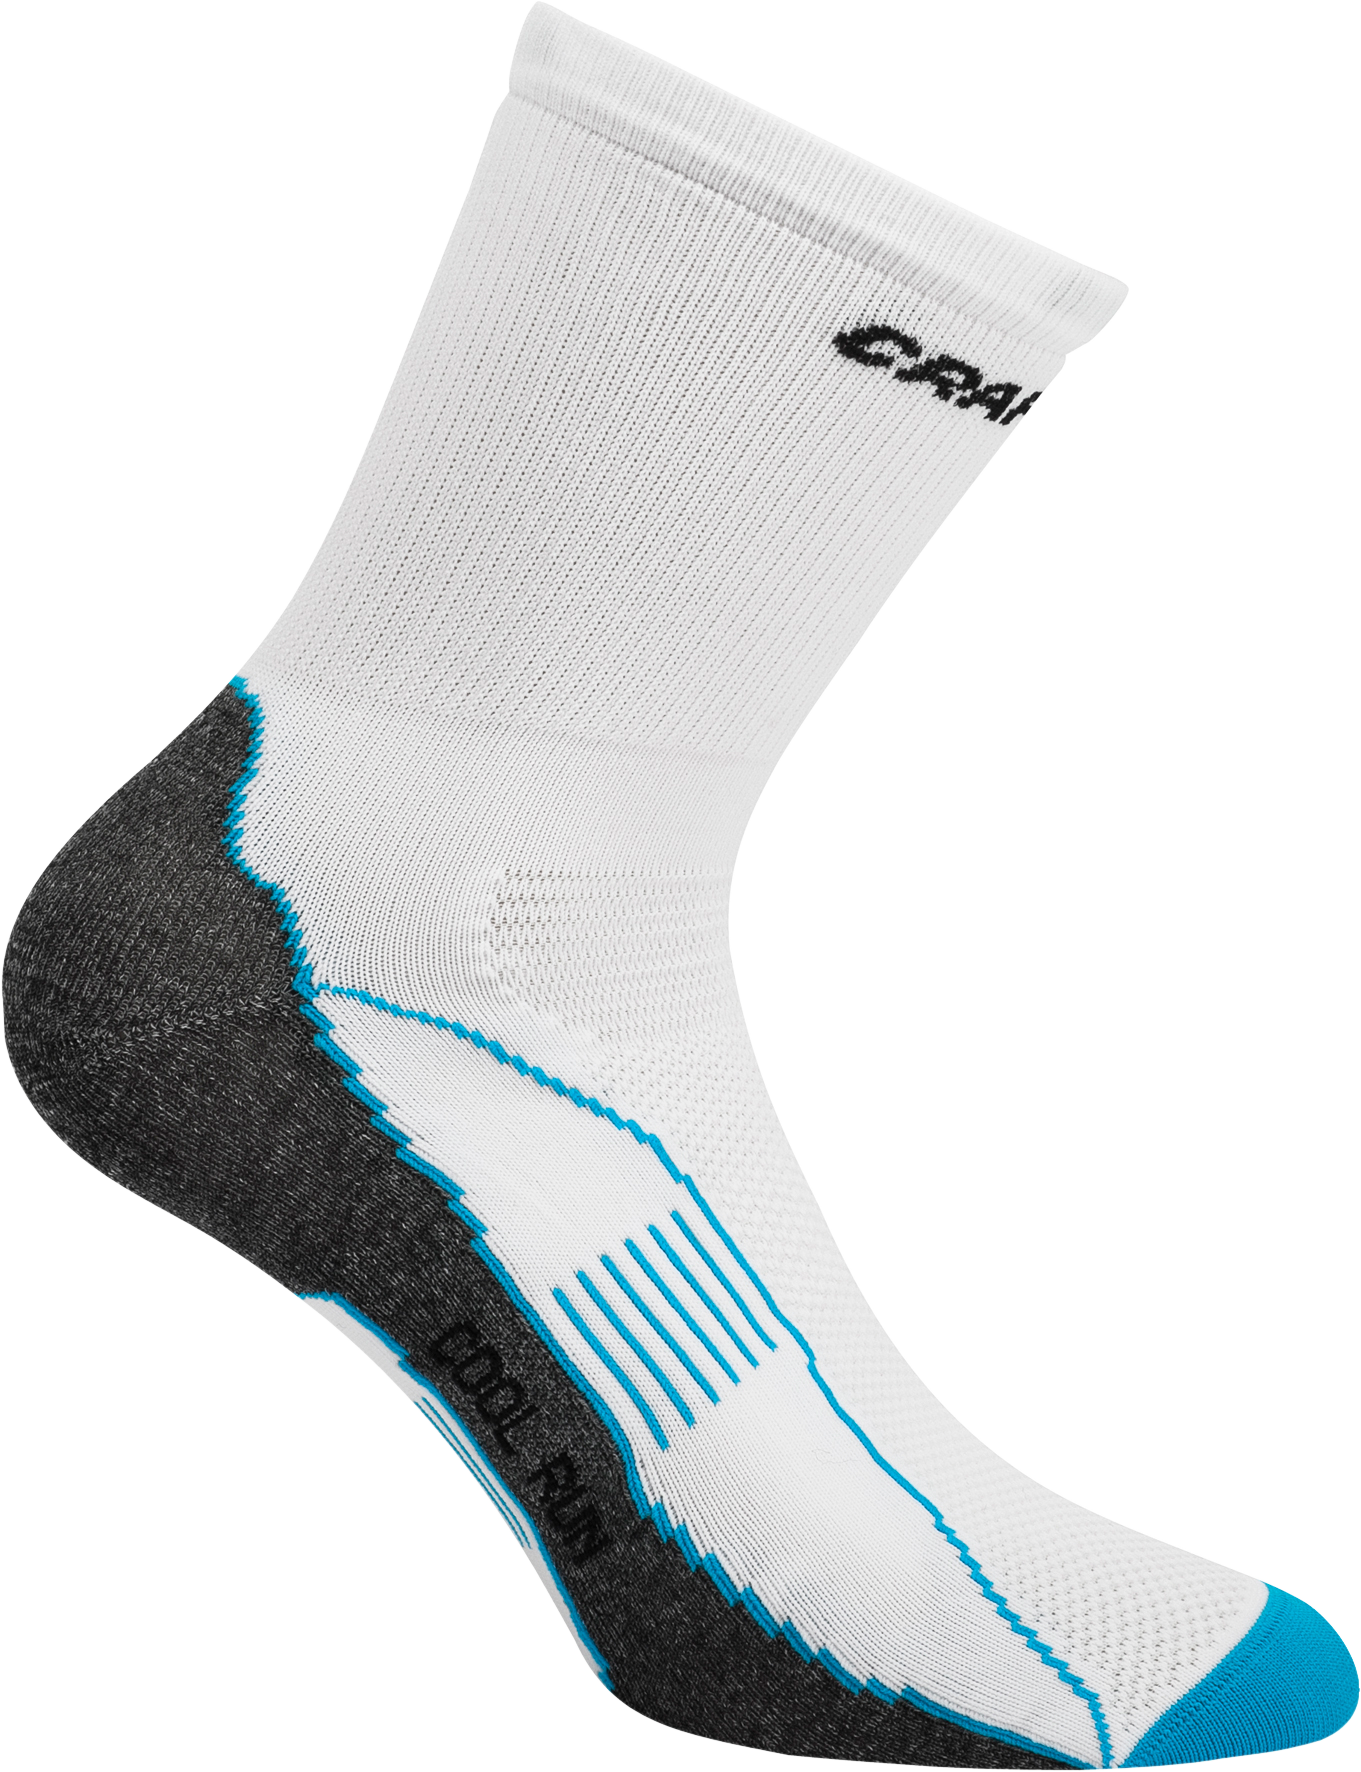 Cool Run Sock, unisex